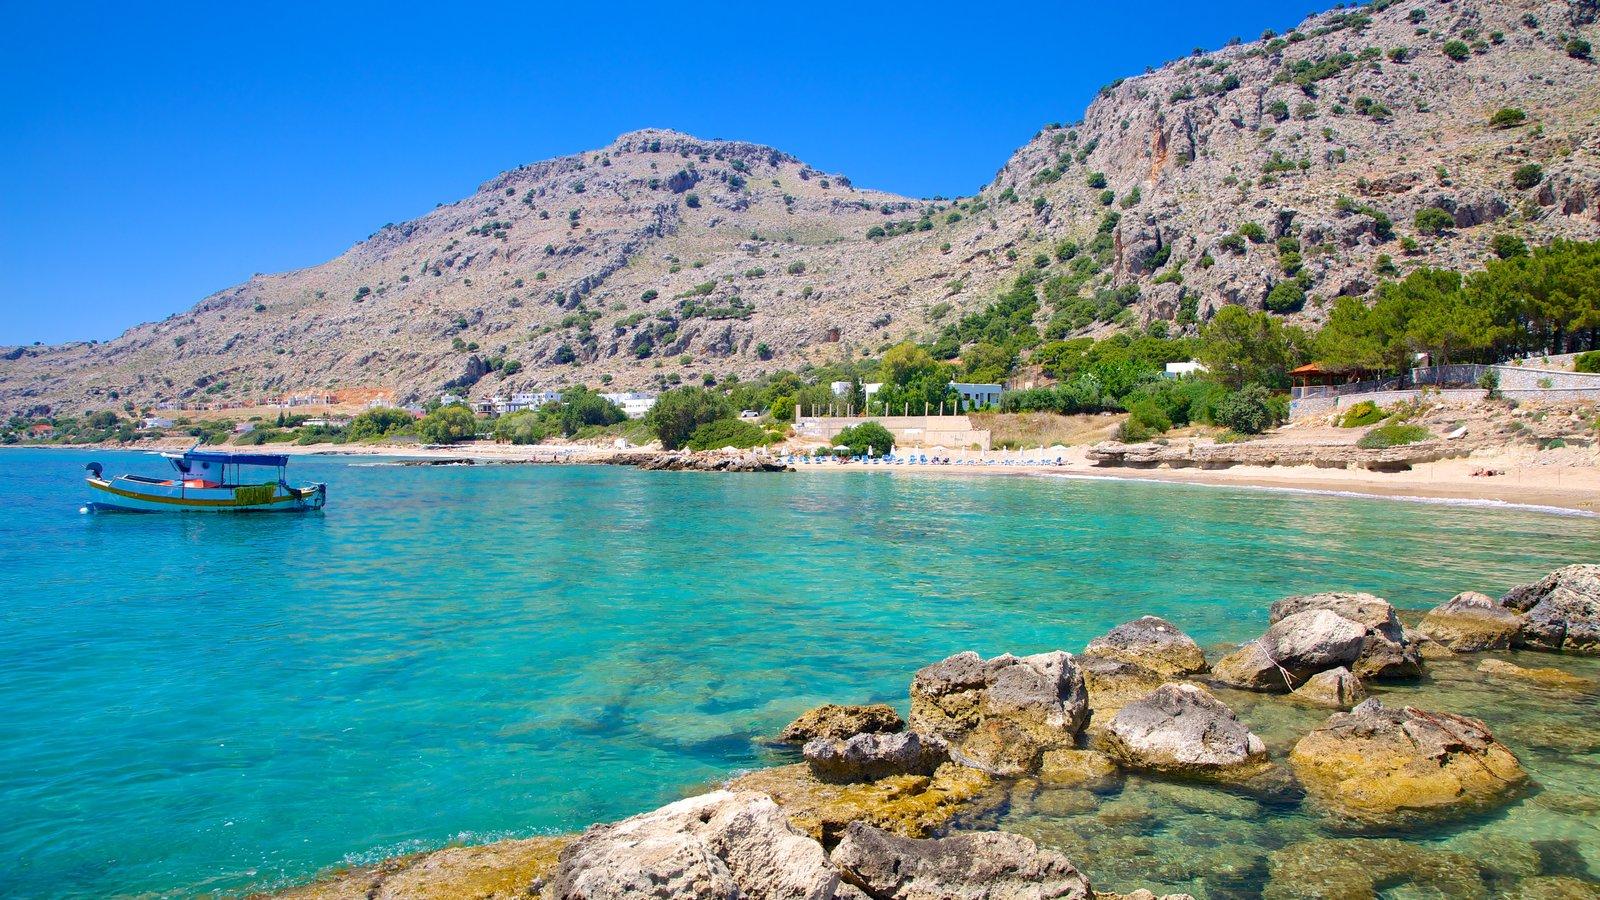 Pefkos Island Resort